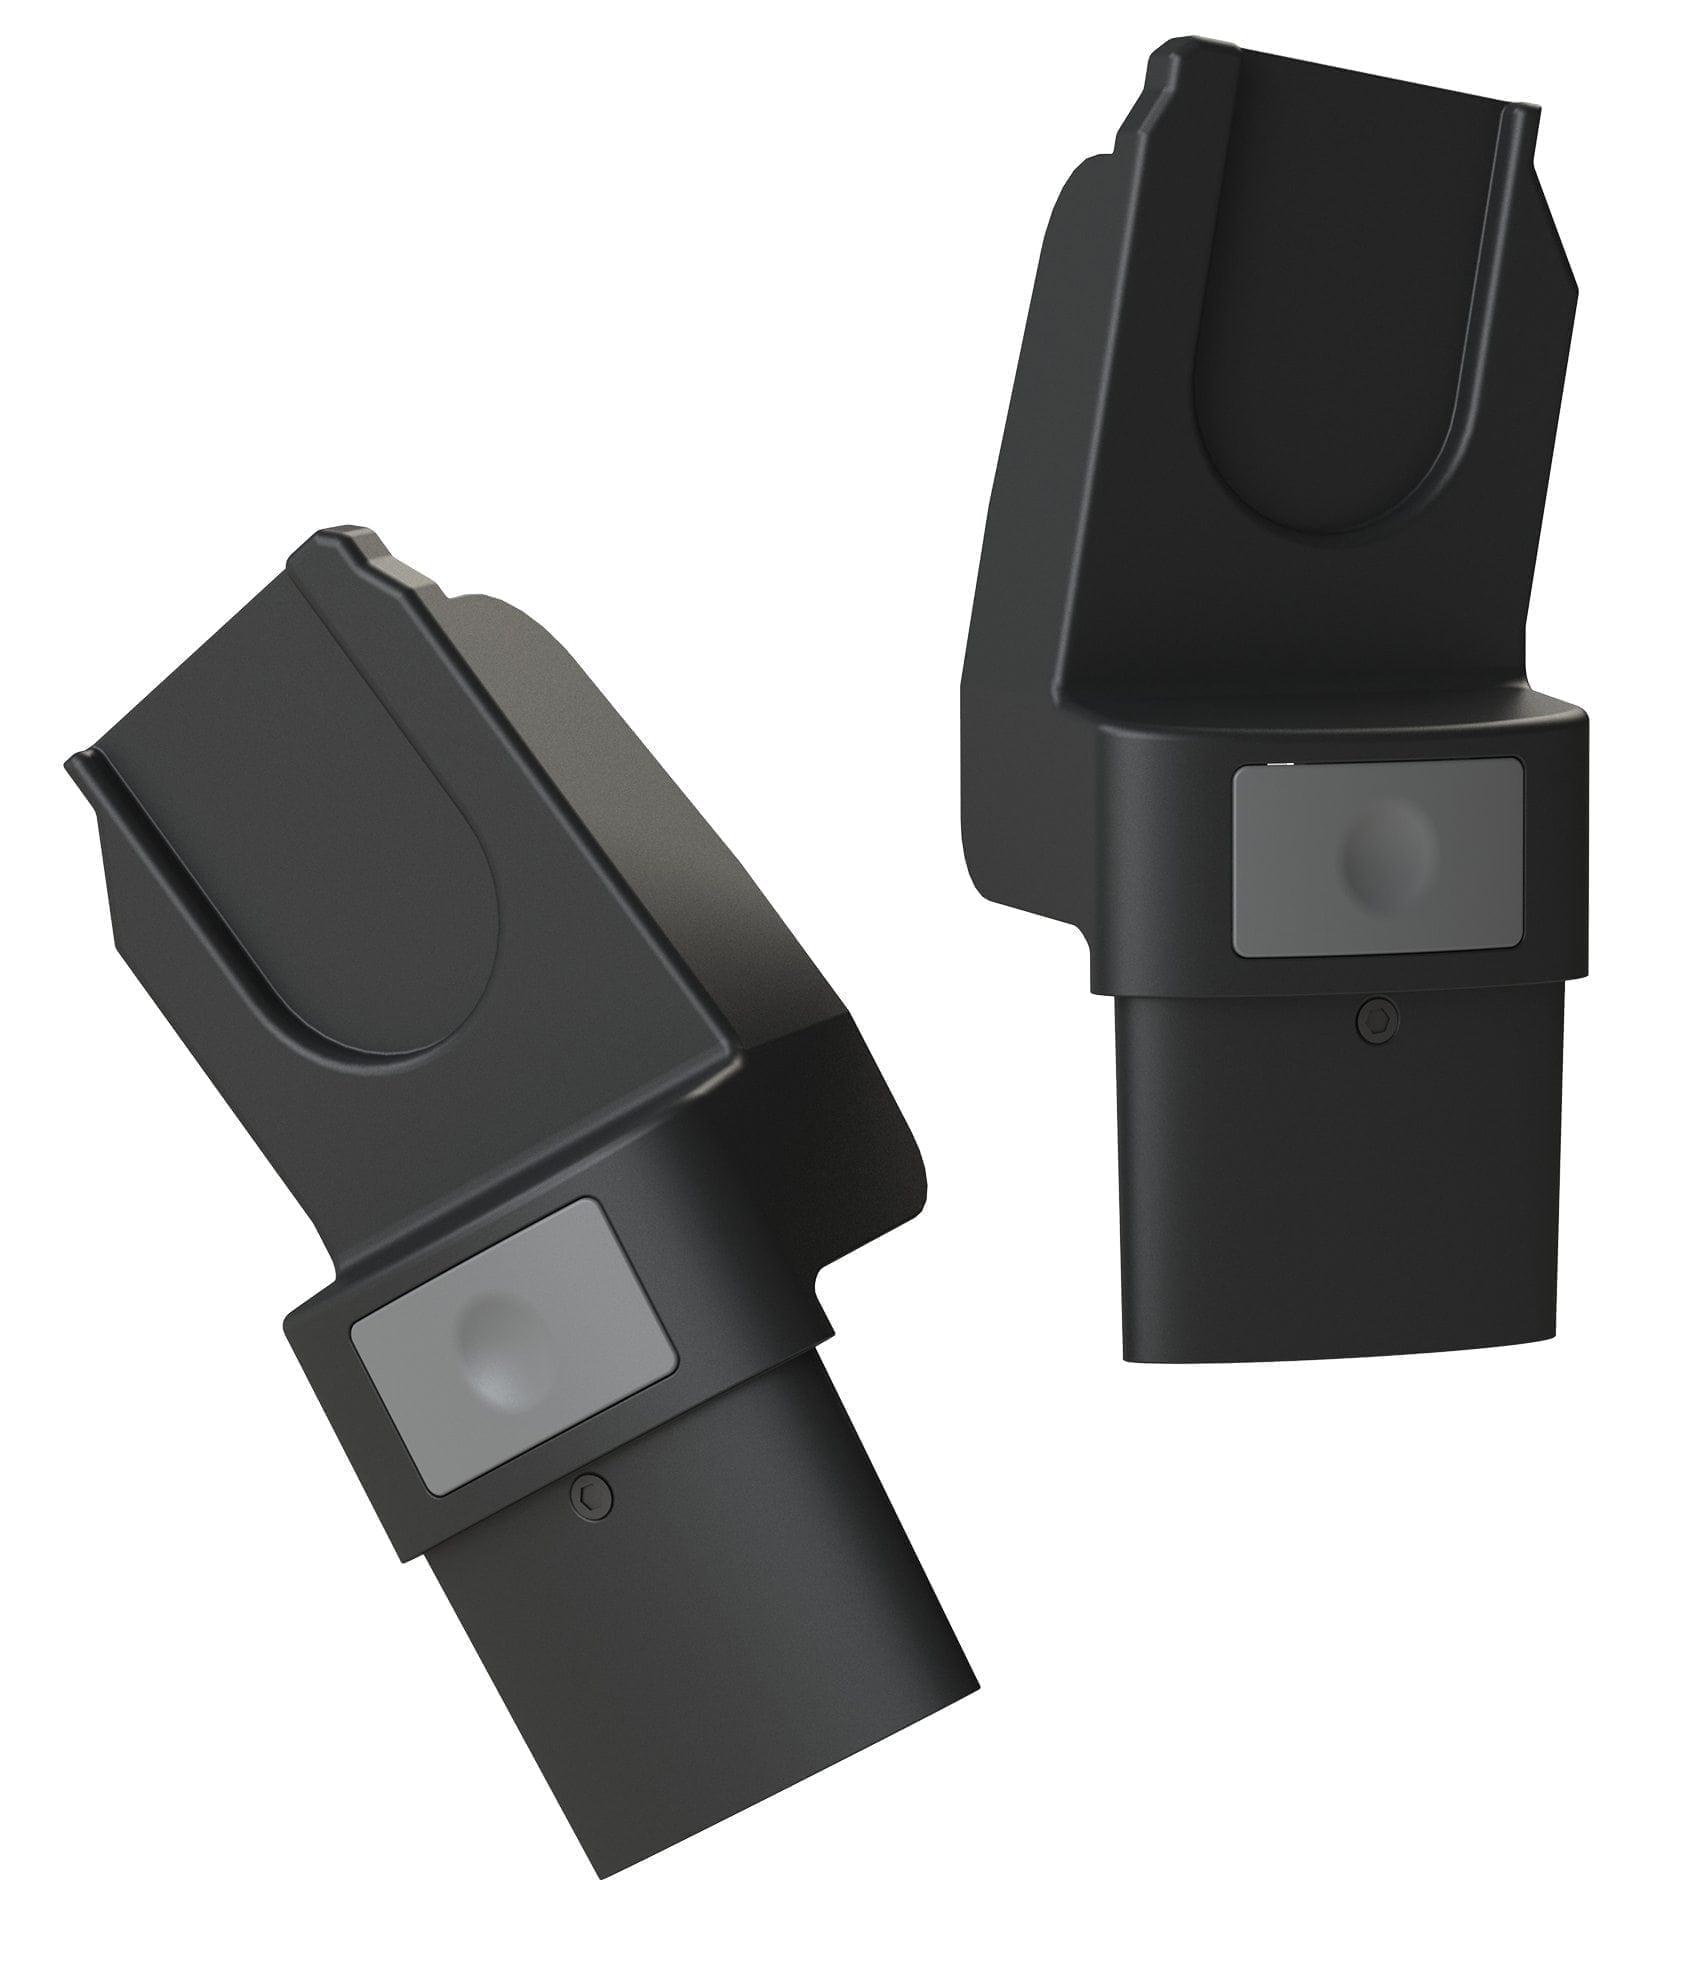 Joolz_Day_sup2__-_car_seat_adapter_LR